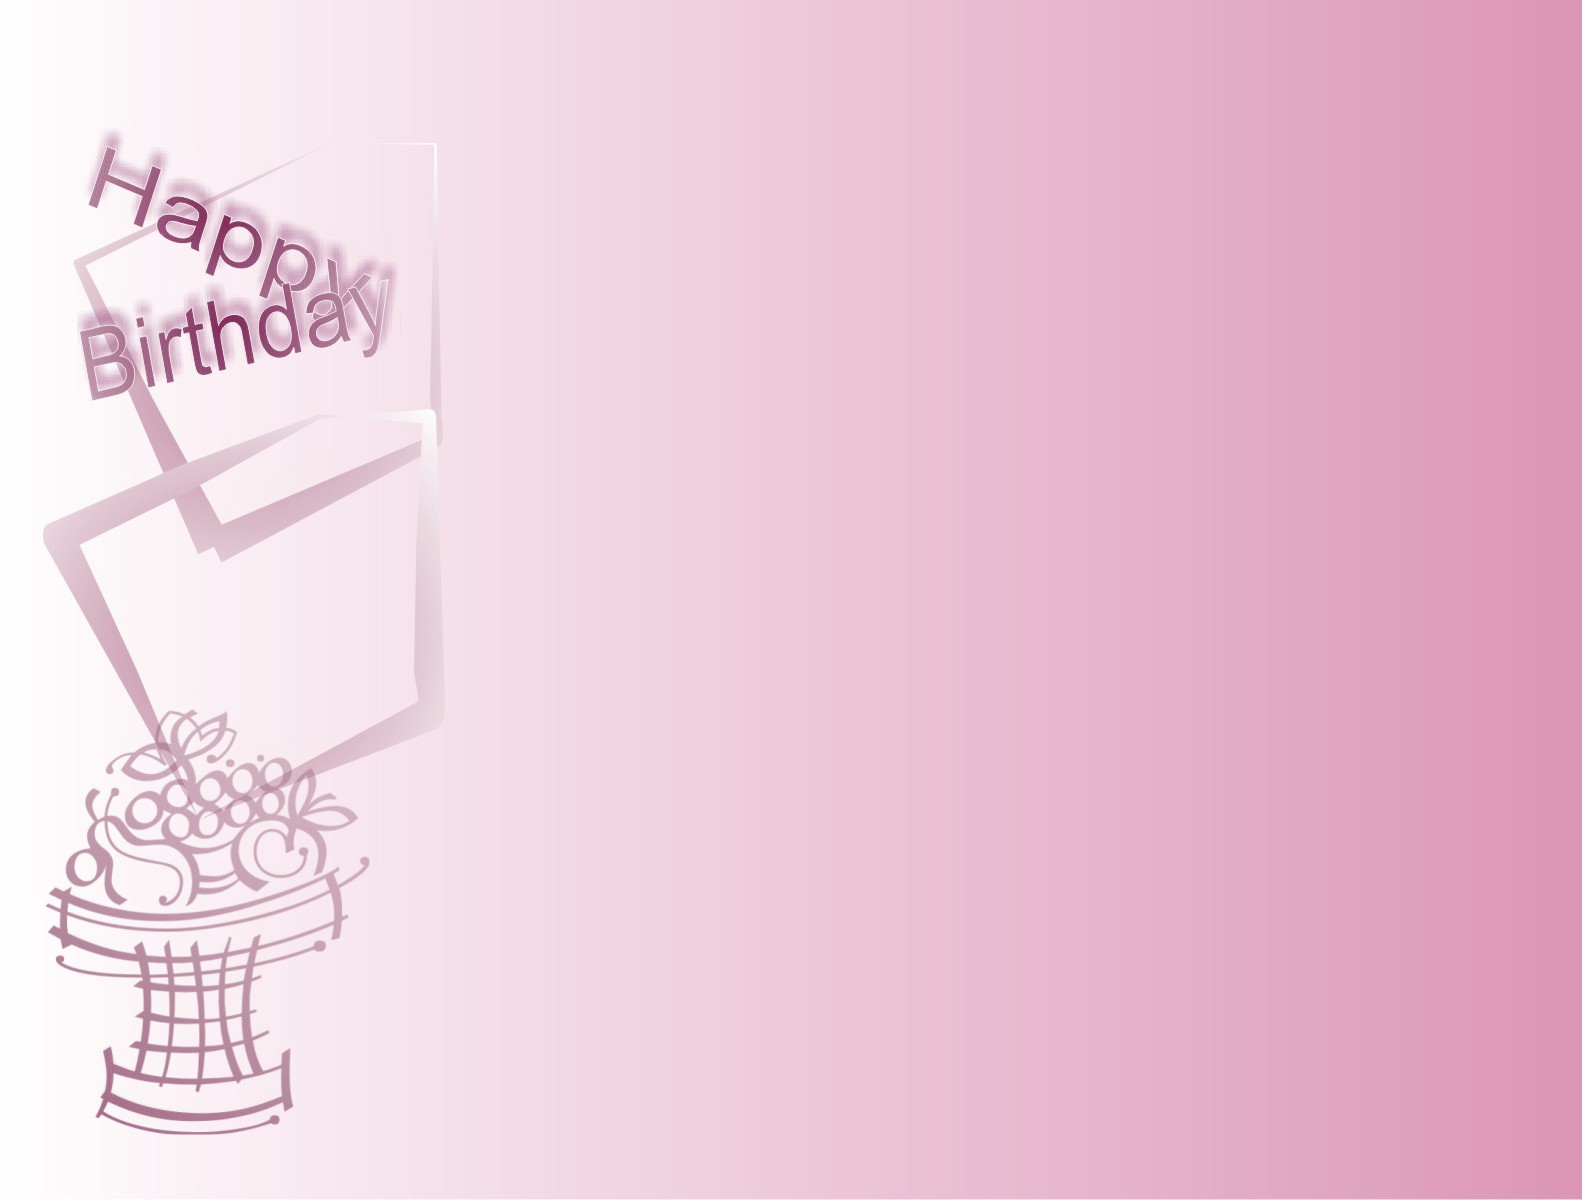 happy birthday mickey mouse birthday wallpapers 3 birthday wallpaper 1582x1200